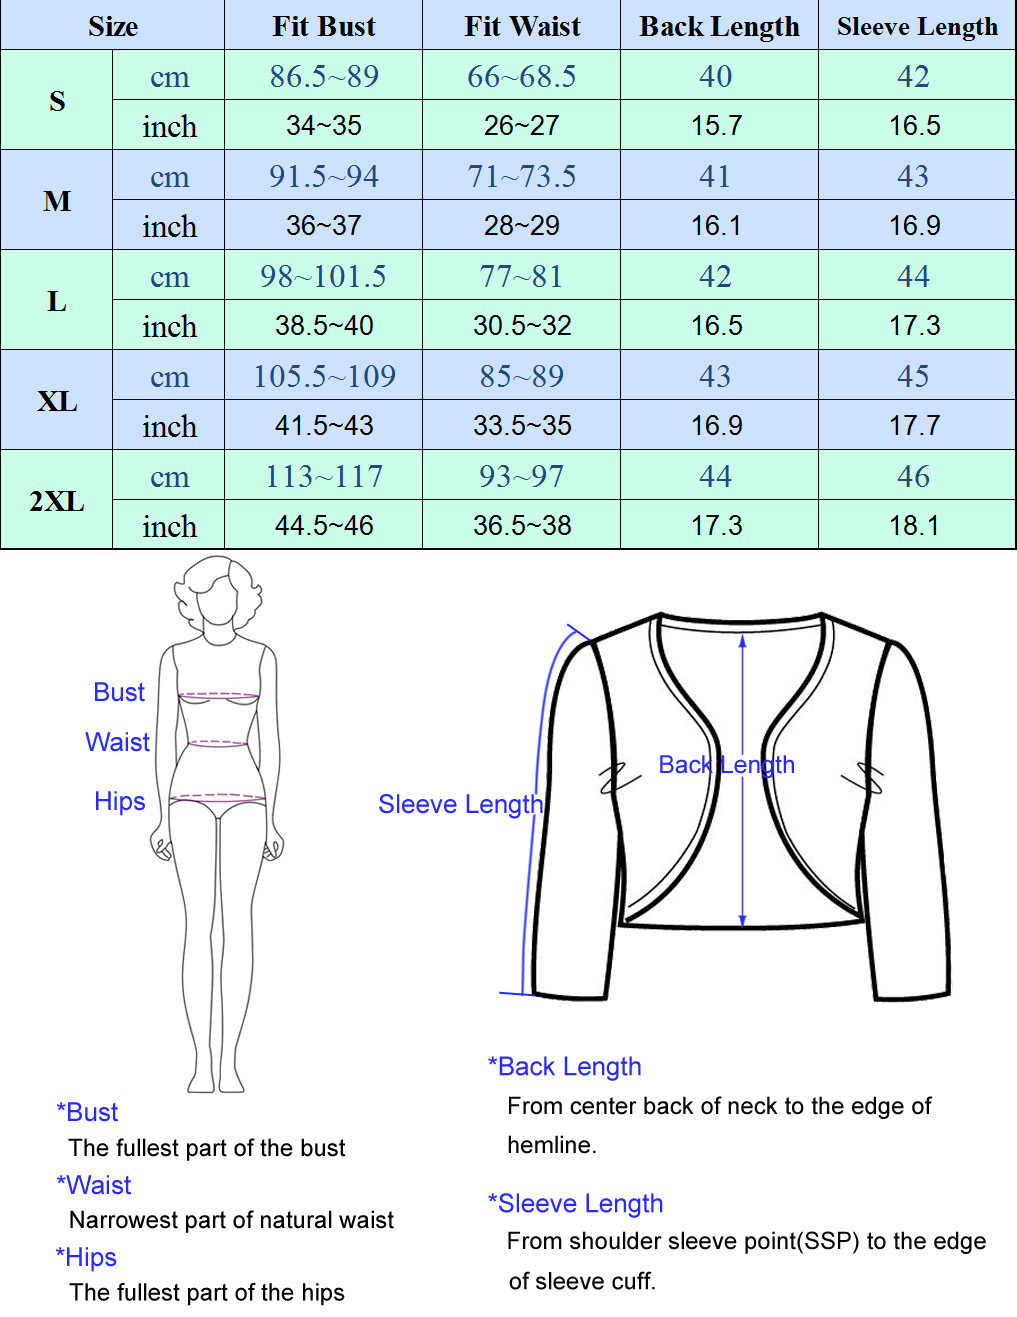 GK Frauen dünne jacke tops 3/4 Hülse Taste Shrug Bolero abend partei elegante kurze Höhlte-out Stricken mantel strickjacke